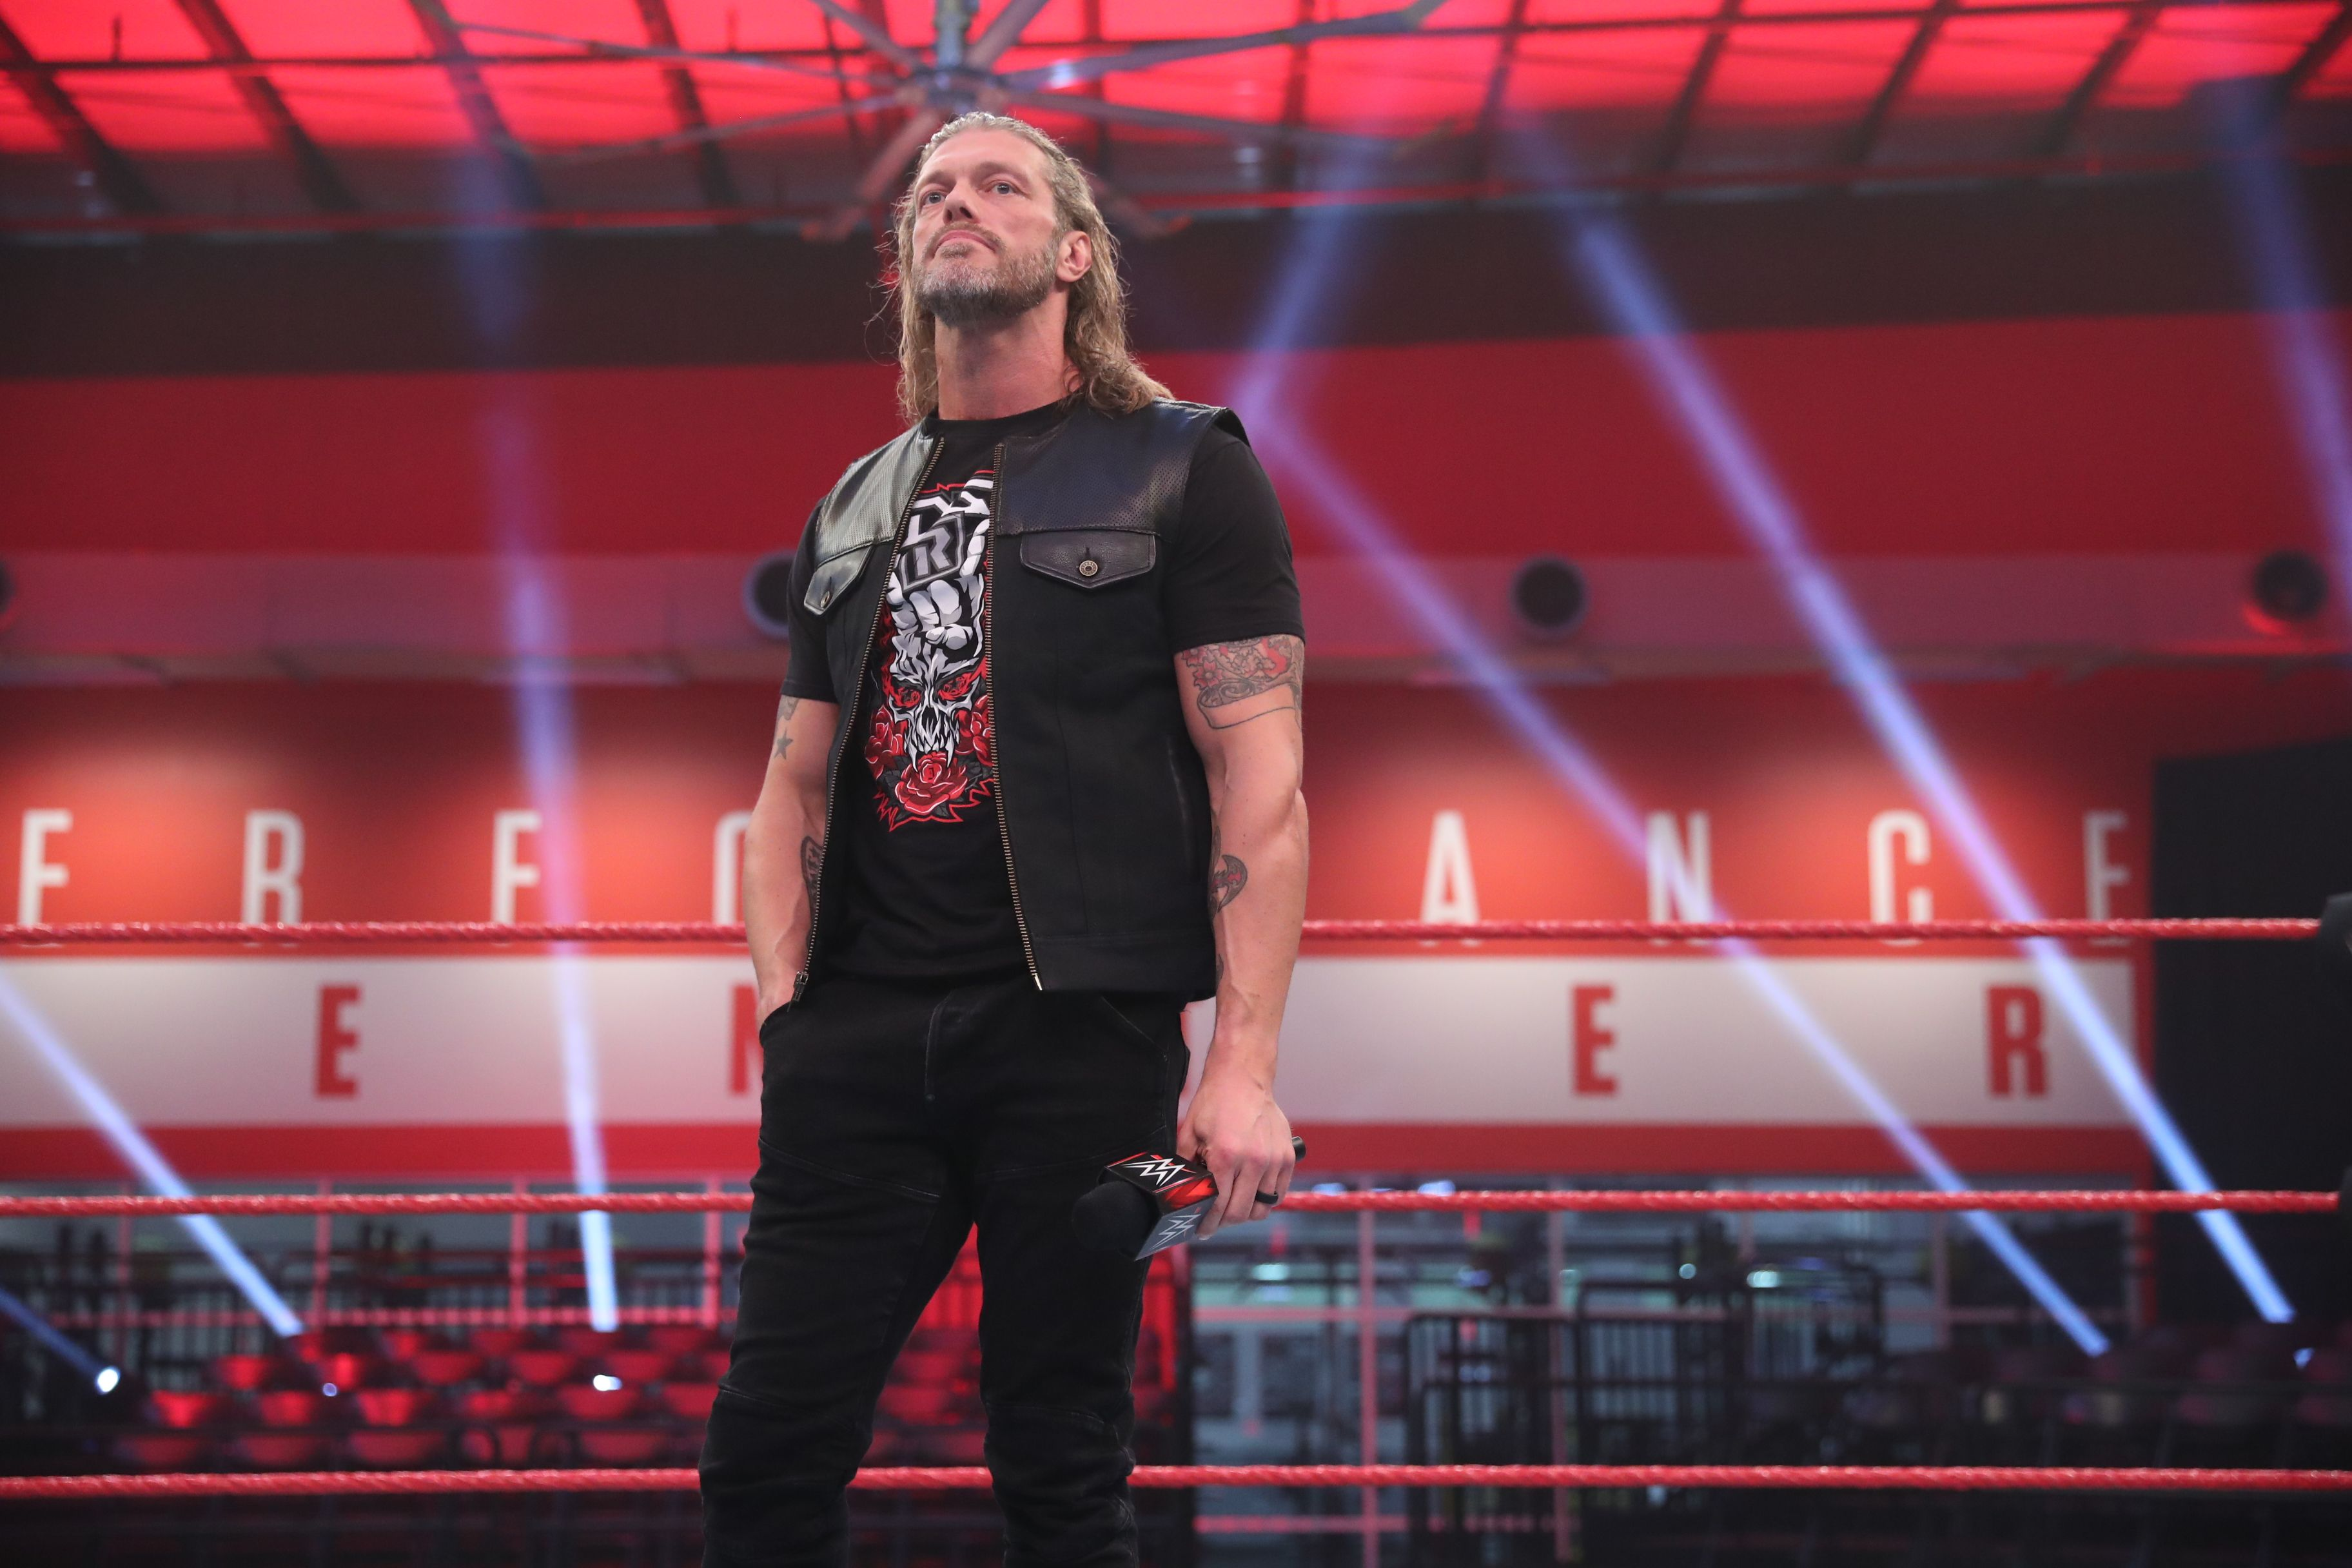 WWE Royal Rumble 2021 - Matches and predictions